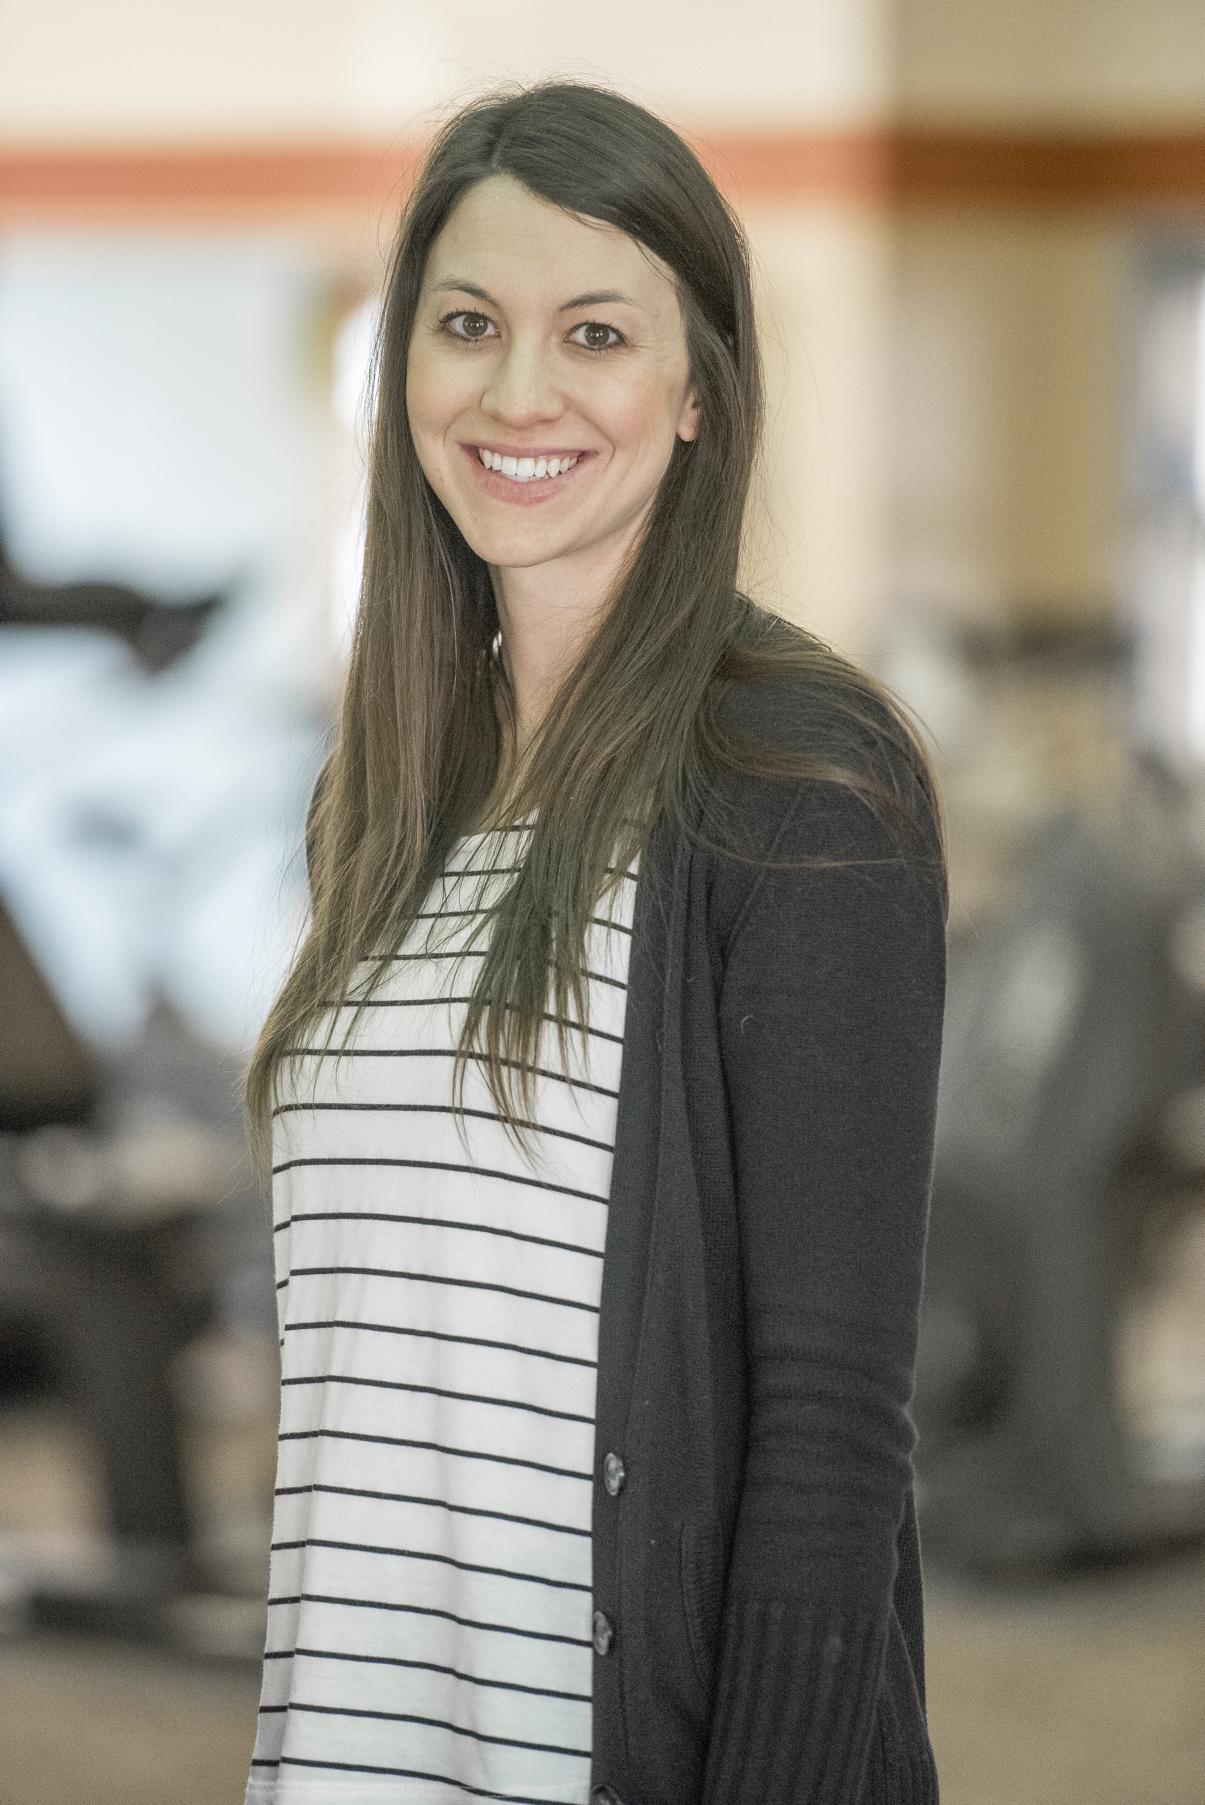 Natasha Choiniere